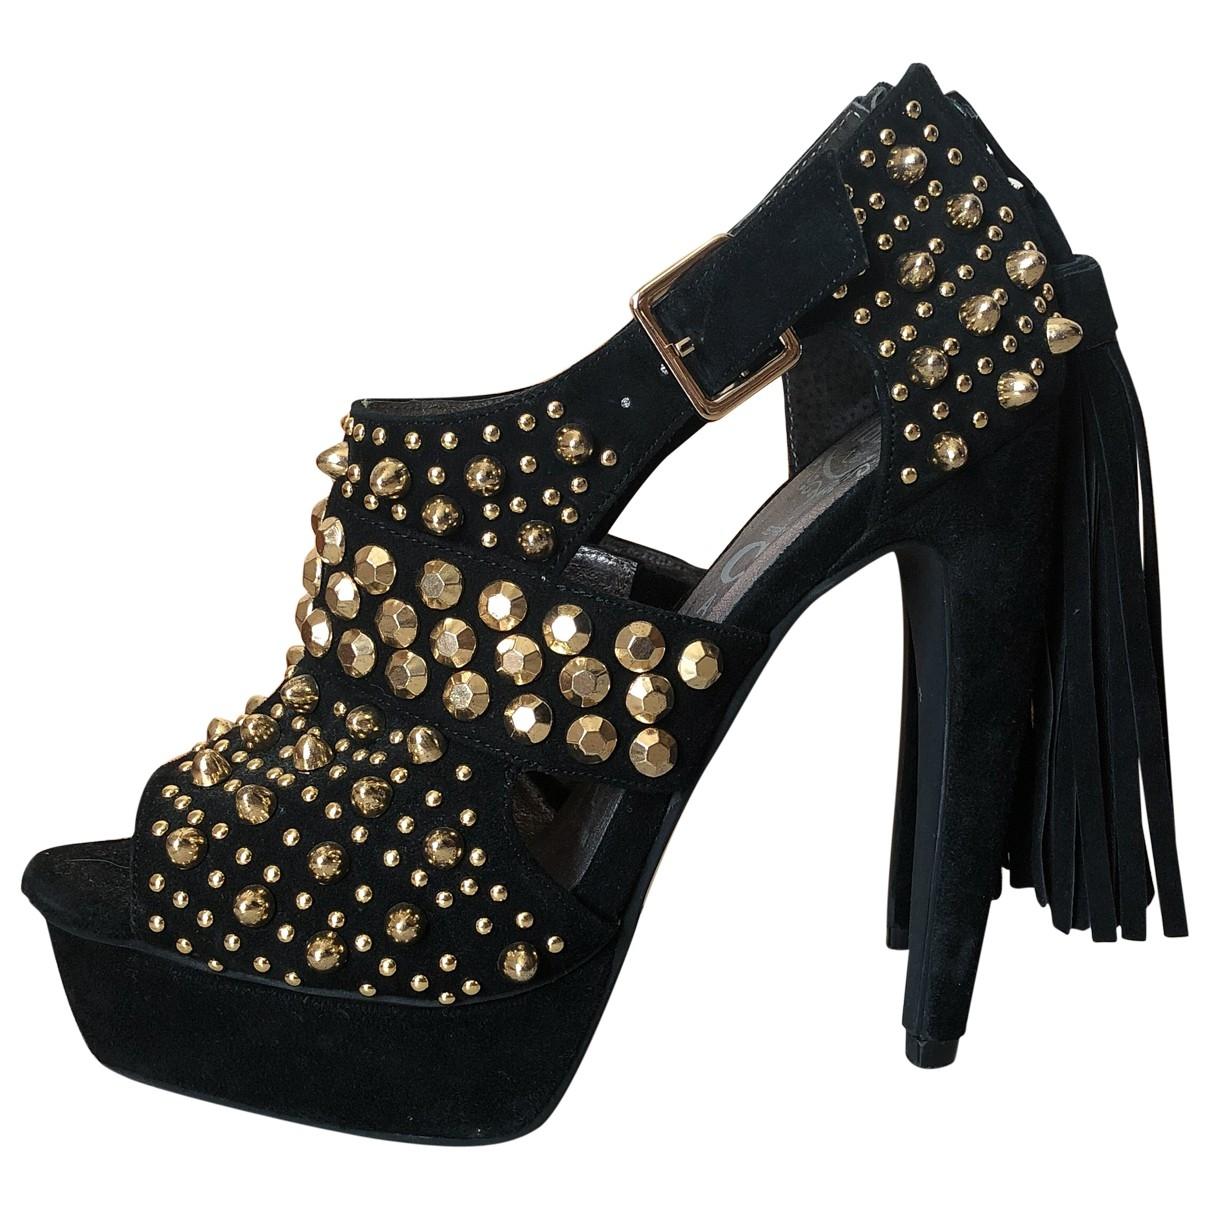 Jeffrey Campbell \N Black Leather Heels for Women 5 UK